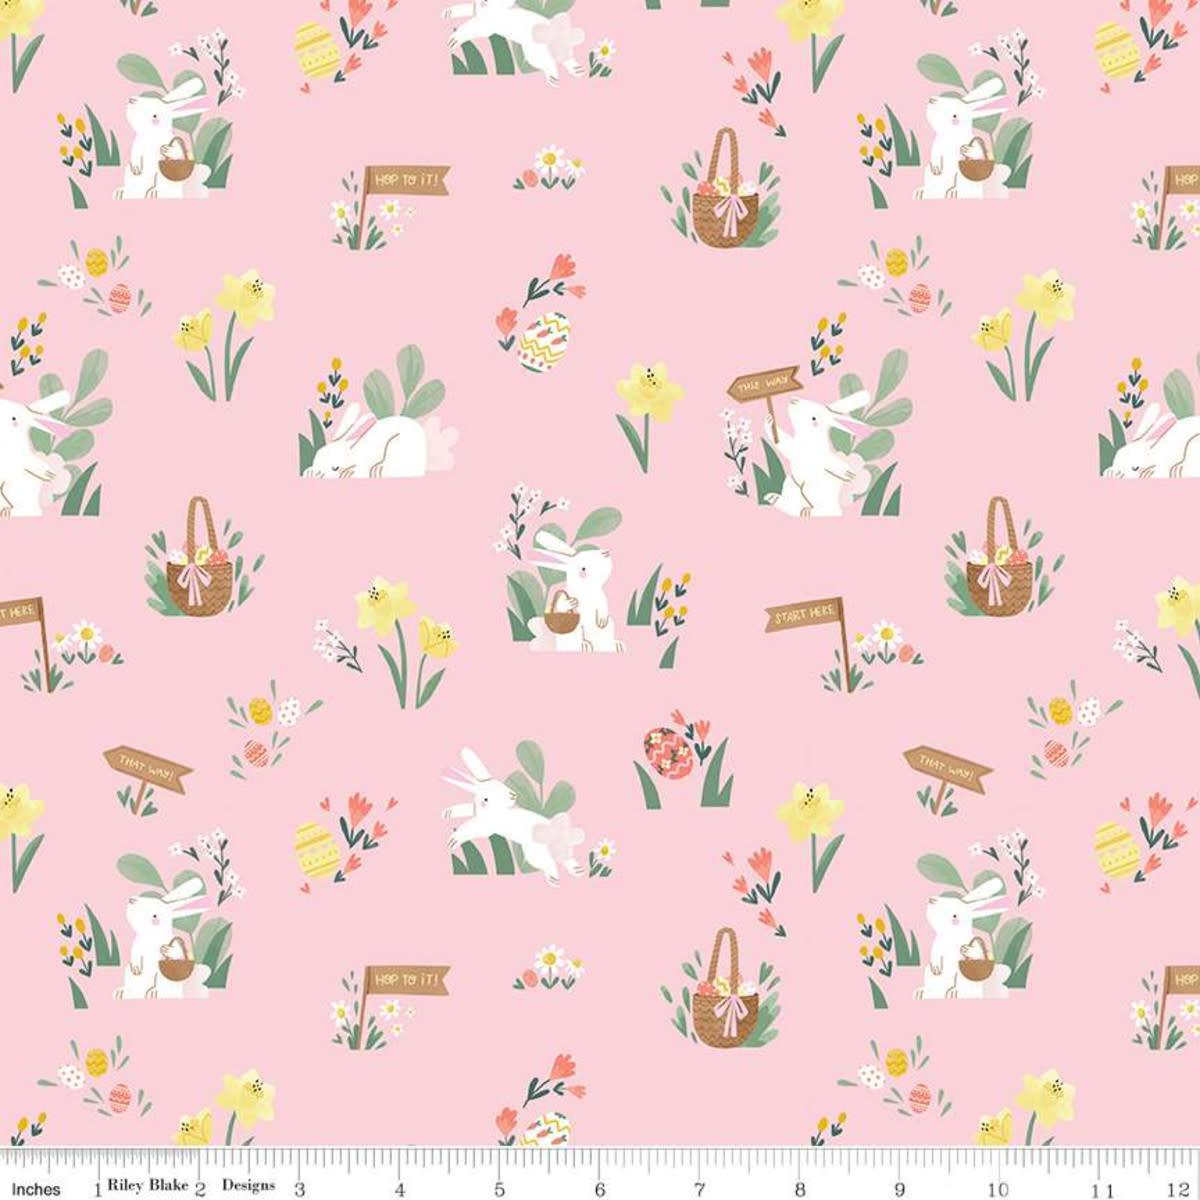 RILEY BLAKE DESIGNS Easter Egg Hunt, Bunnies & Baskets Main, Powder $0.20 per cm or $20/m